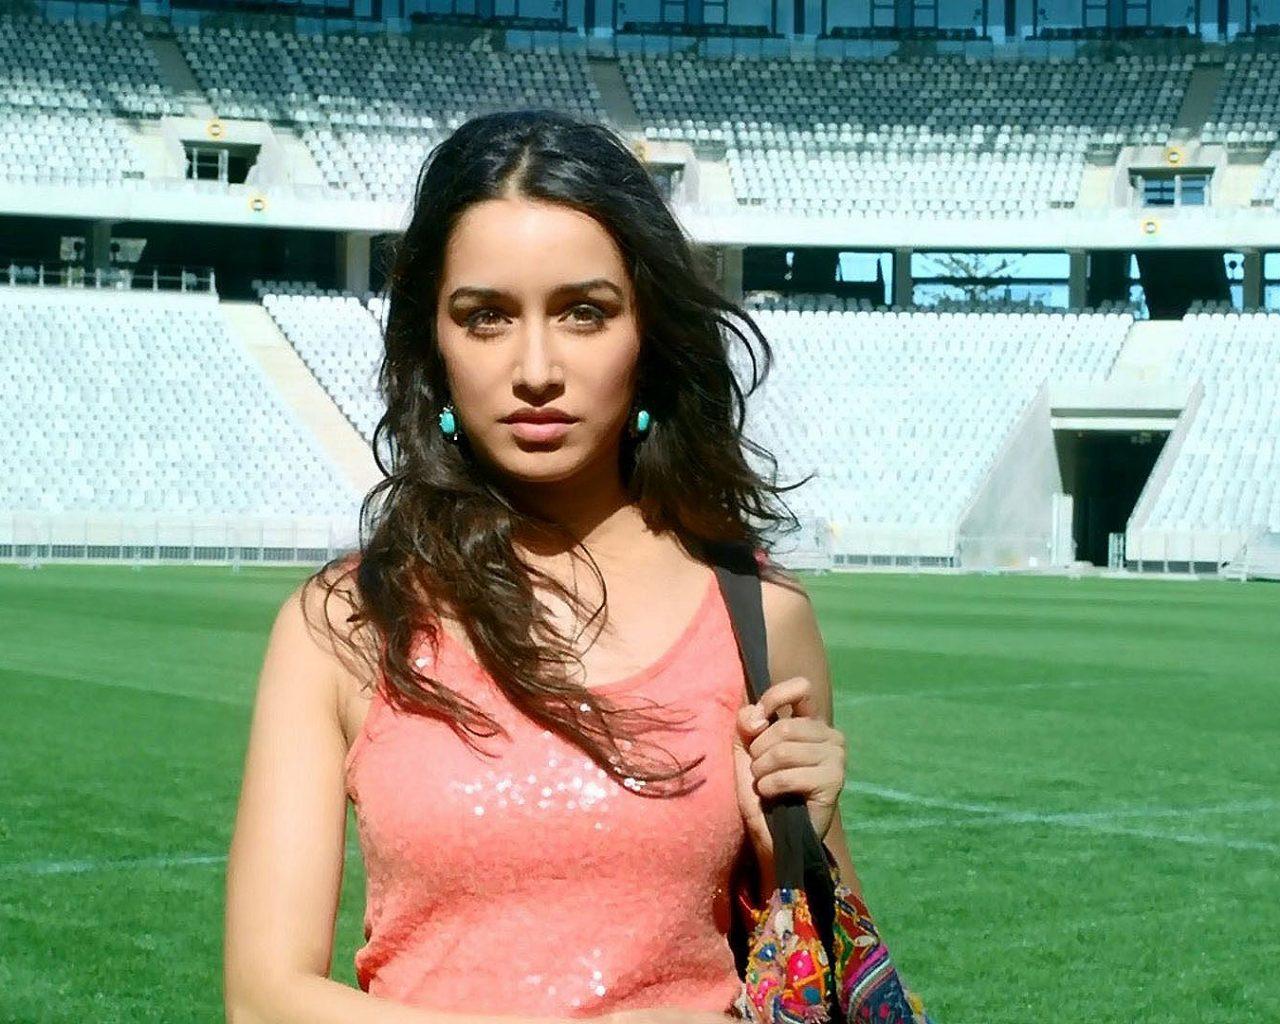 Download Shraddha Kapoor In Aashiqui 2 Movie Hd Wallpaper: Shraddha Kapoor Aashiqui 2 Wallpaper